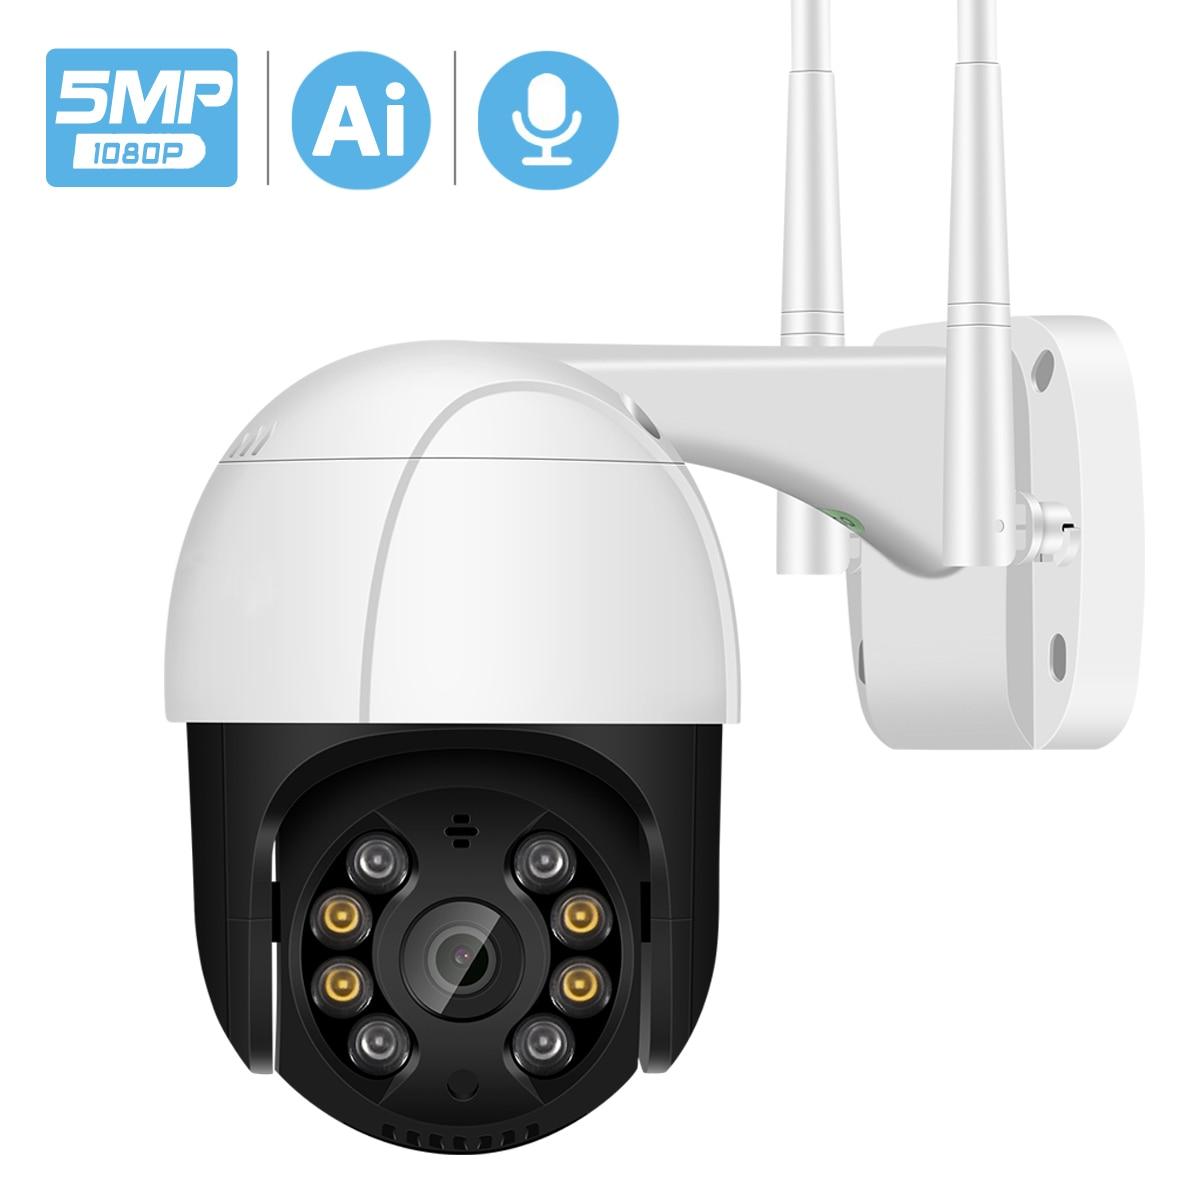 5MP H.265 + تتبع السيارات PTZ واي فاي كاميرا IP في الهواء الطلق 1080P HD 3MP واي فاي كاميرا لاسلكية الصوت AI الإنسان كشف الأمن كاميرا تلفزيونات الدوائر الم...